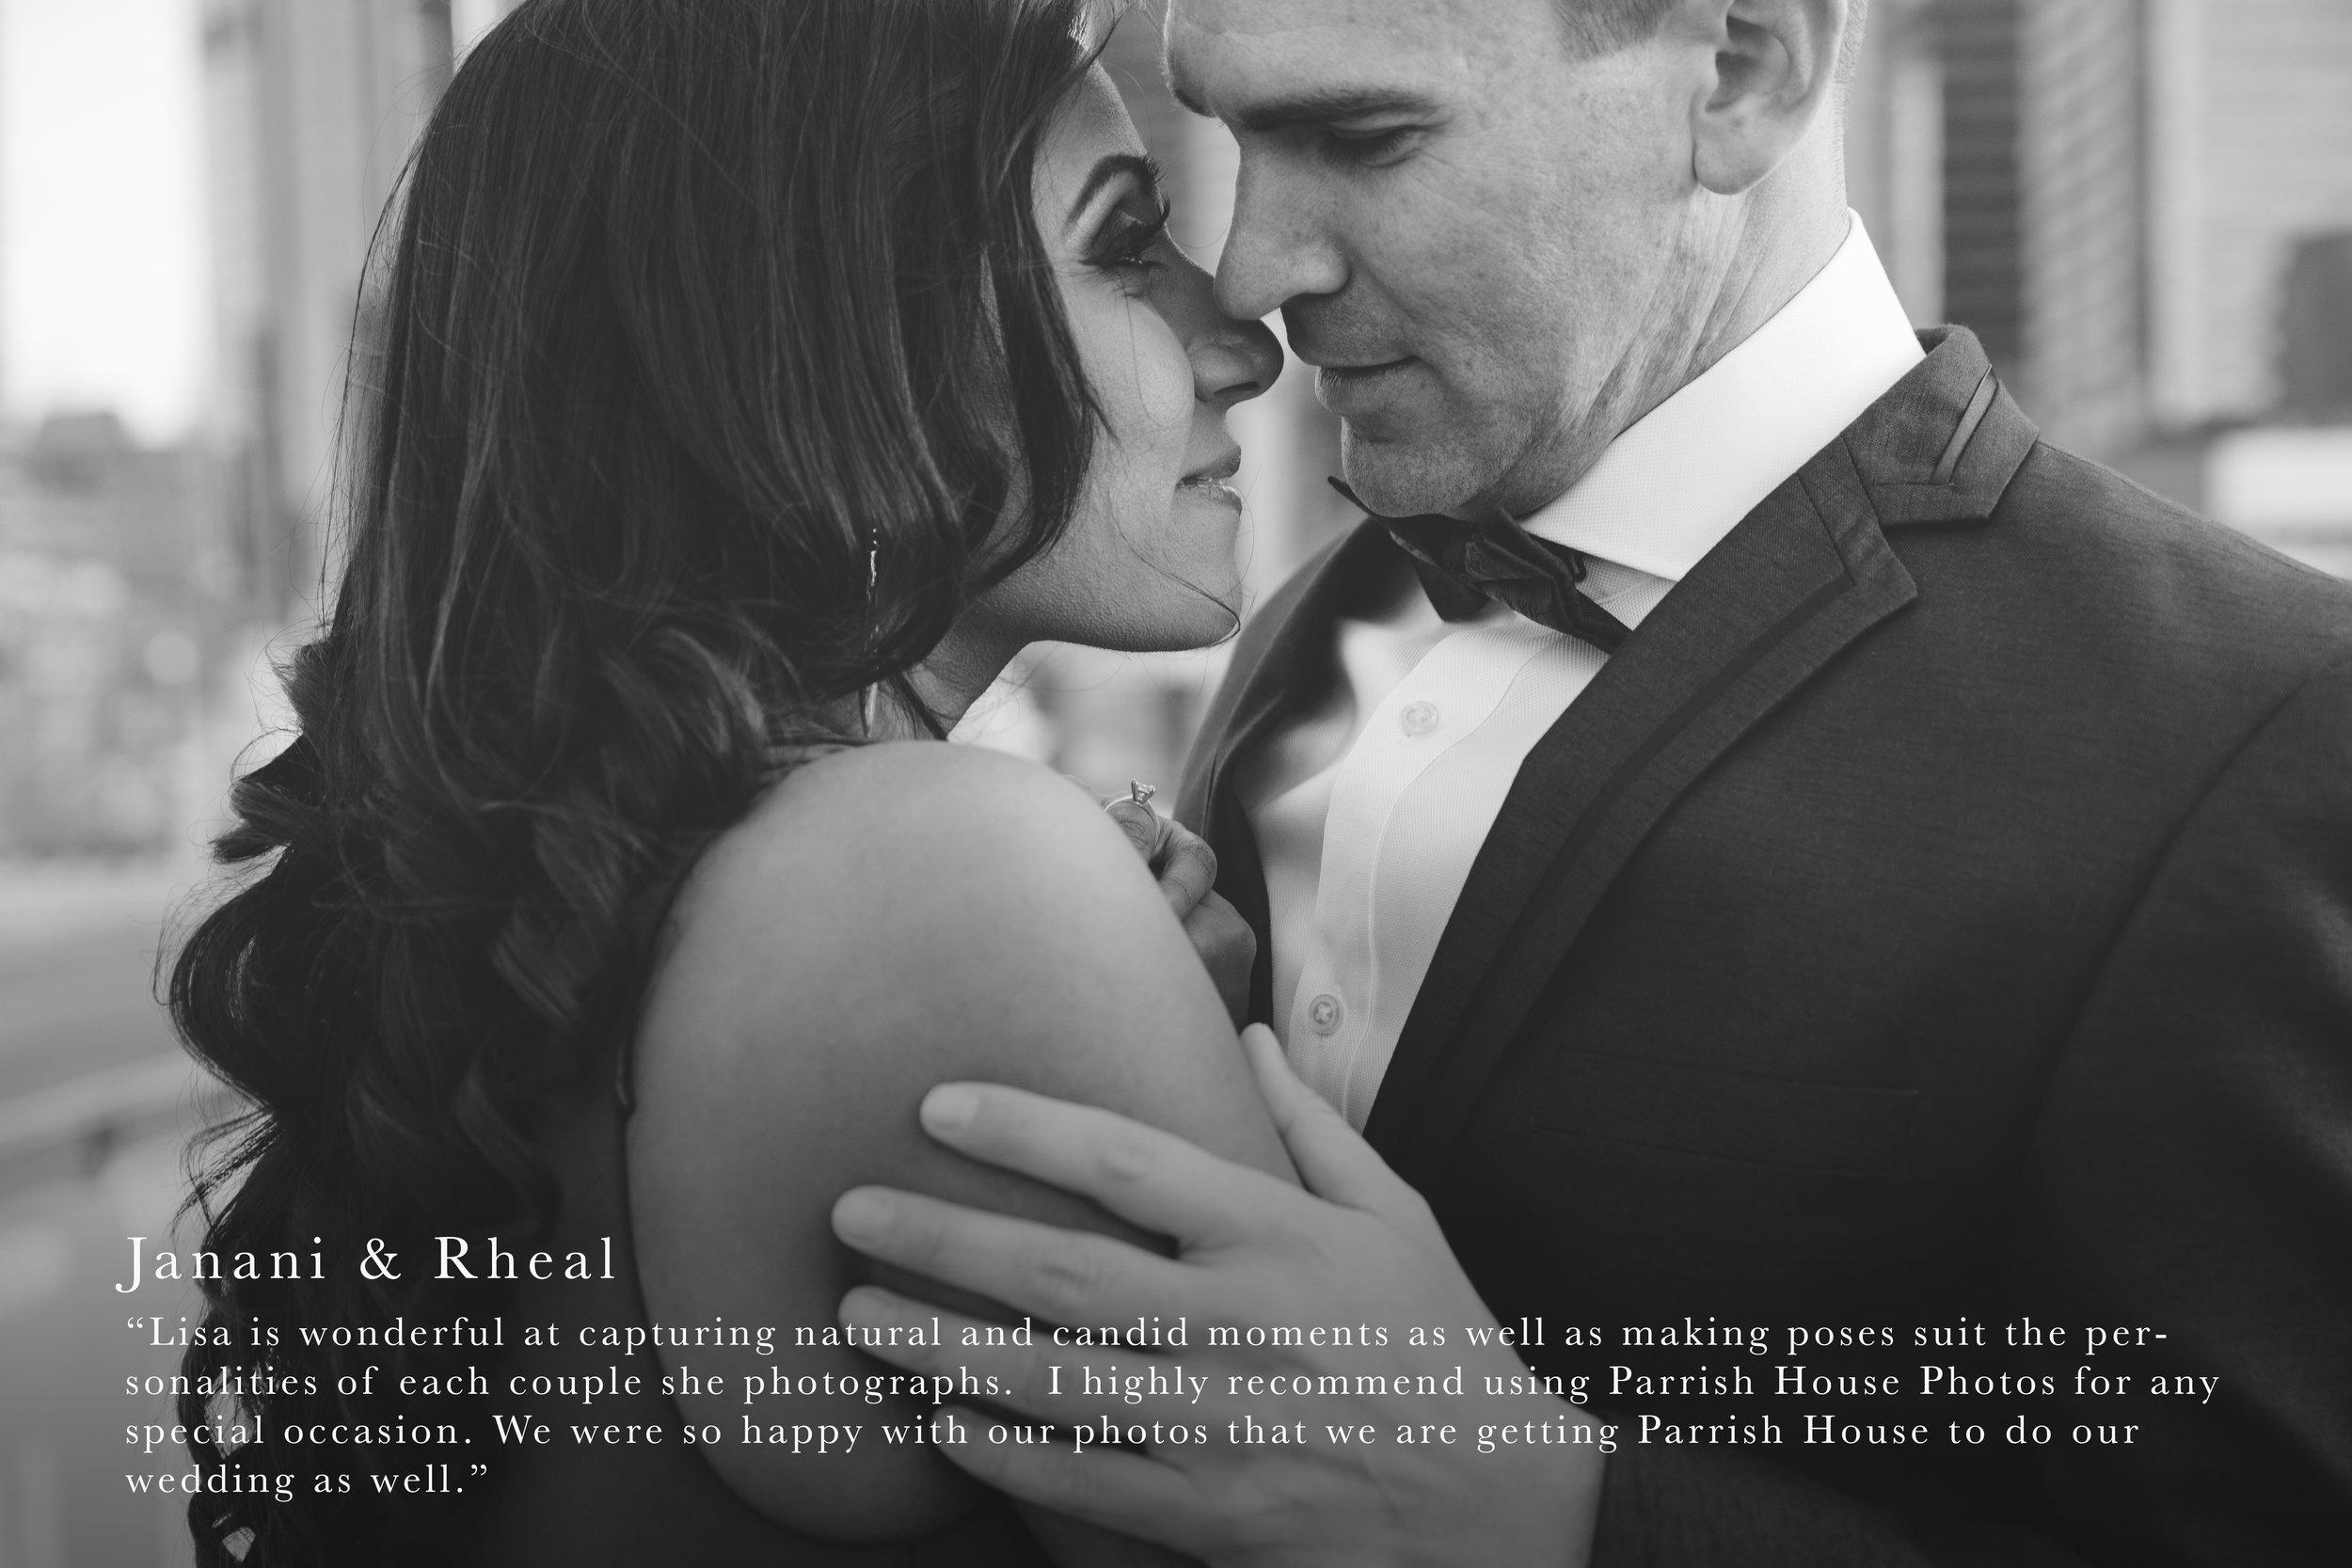 Wedding Photography Review - Janani & Rheal